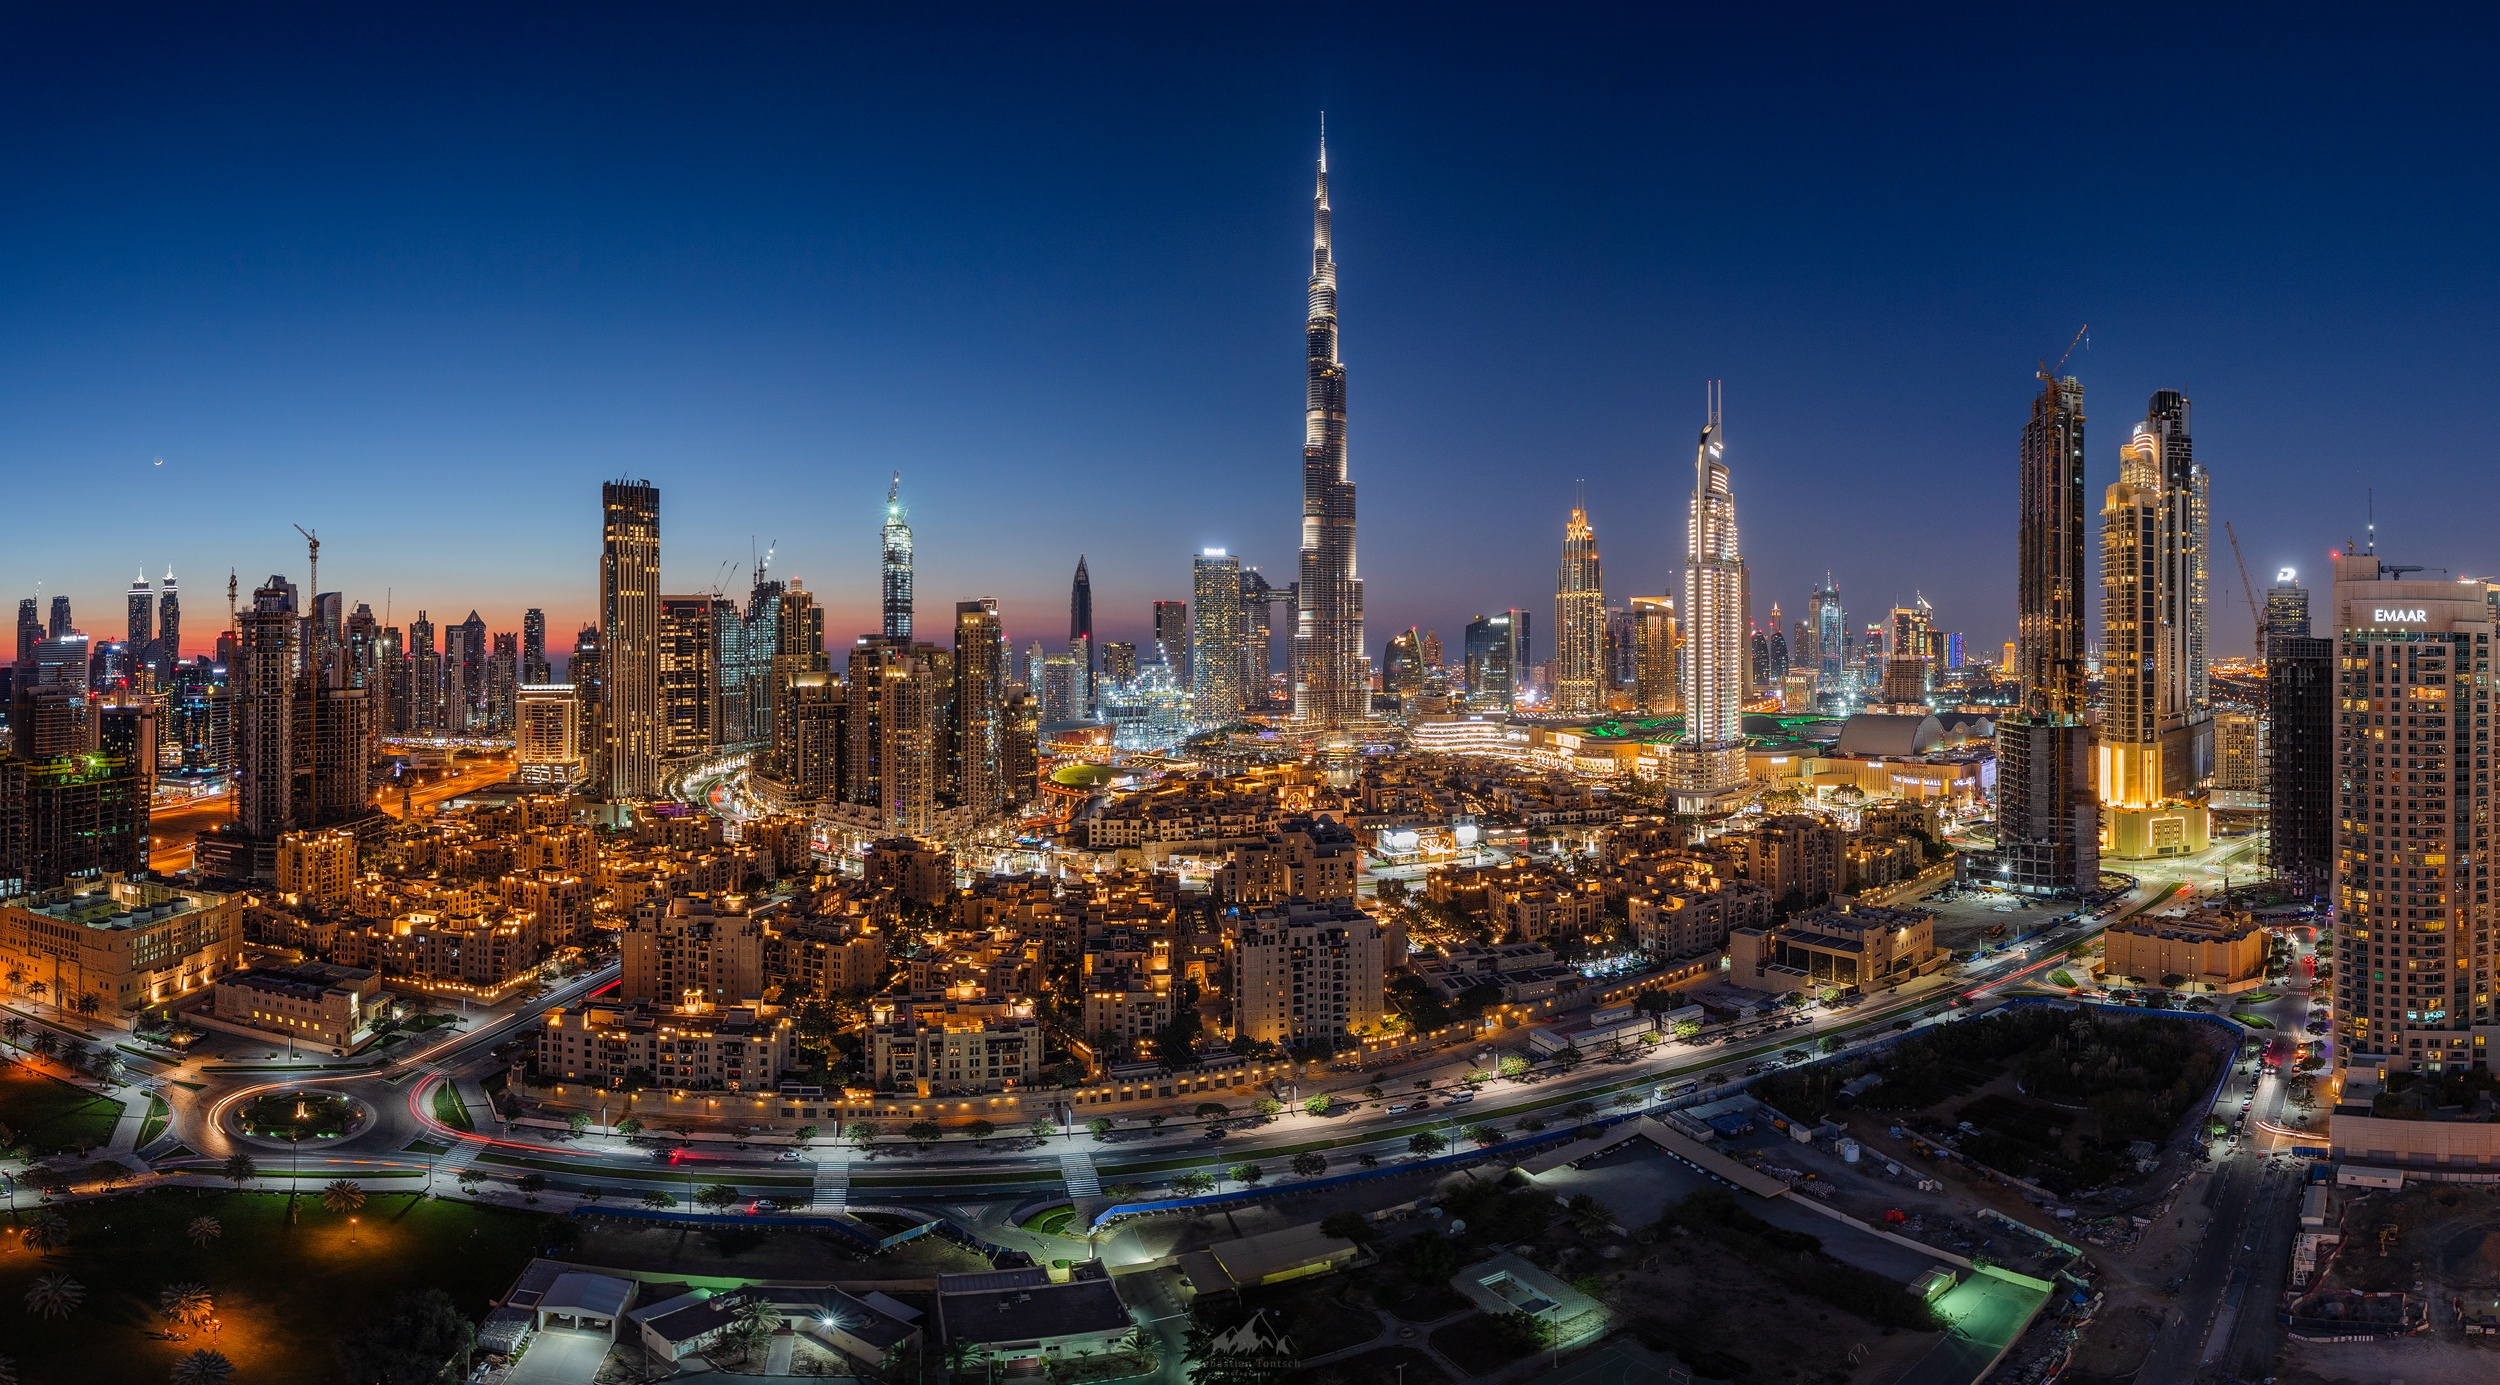 Night City Light Building Skyscraper United Arab Emirates 2500x1385